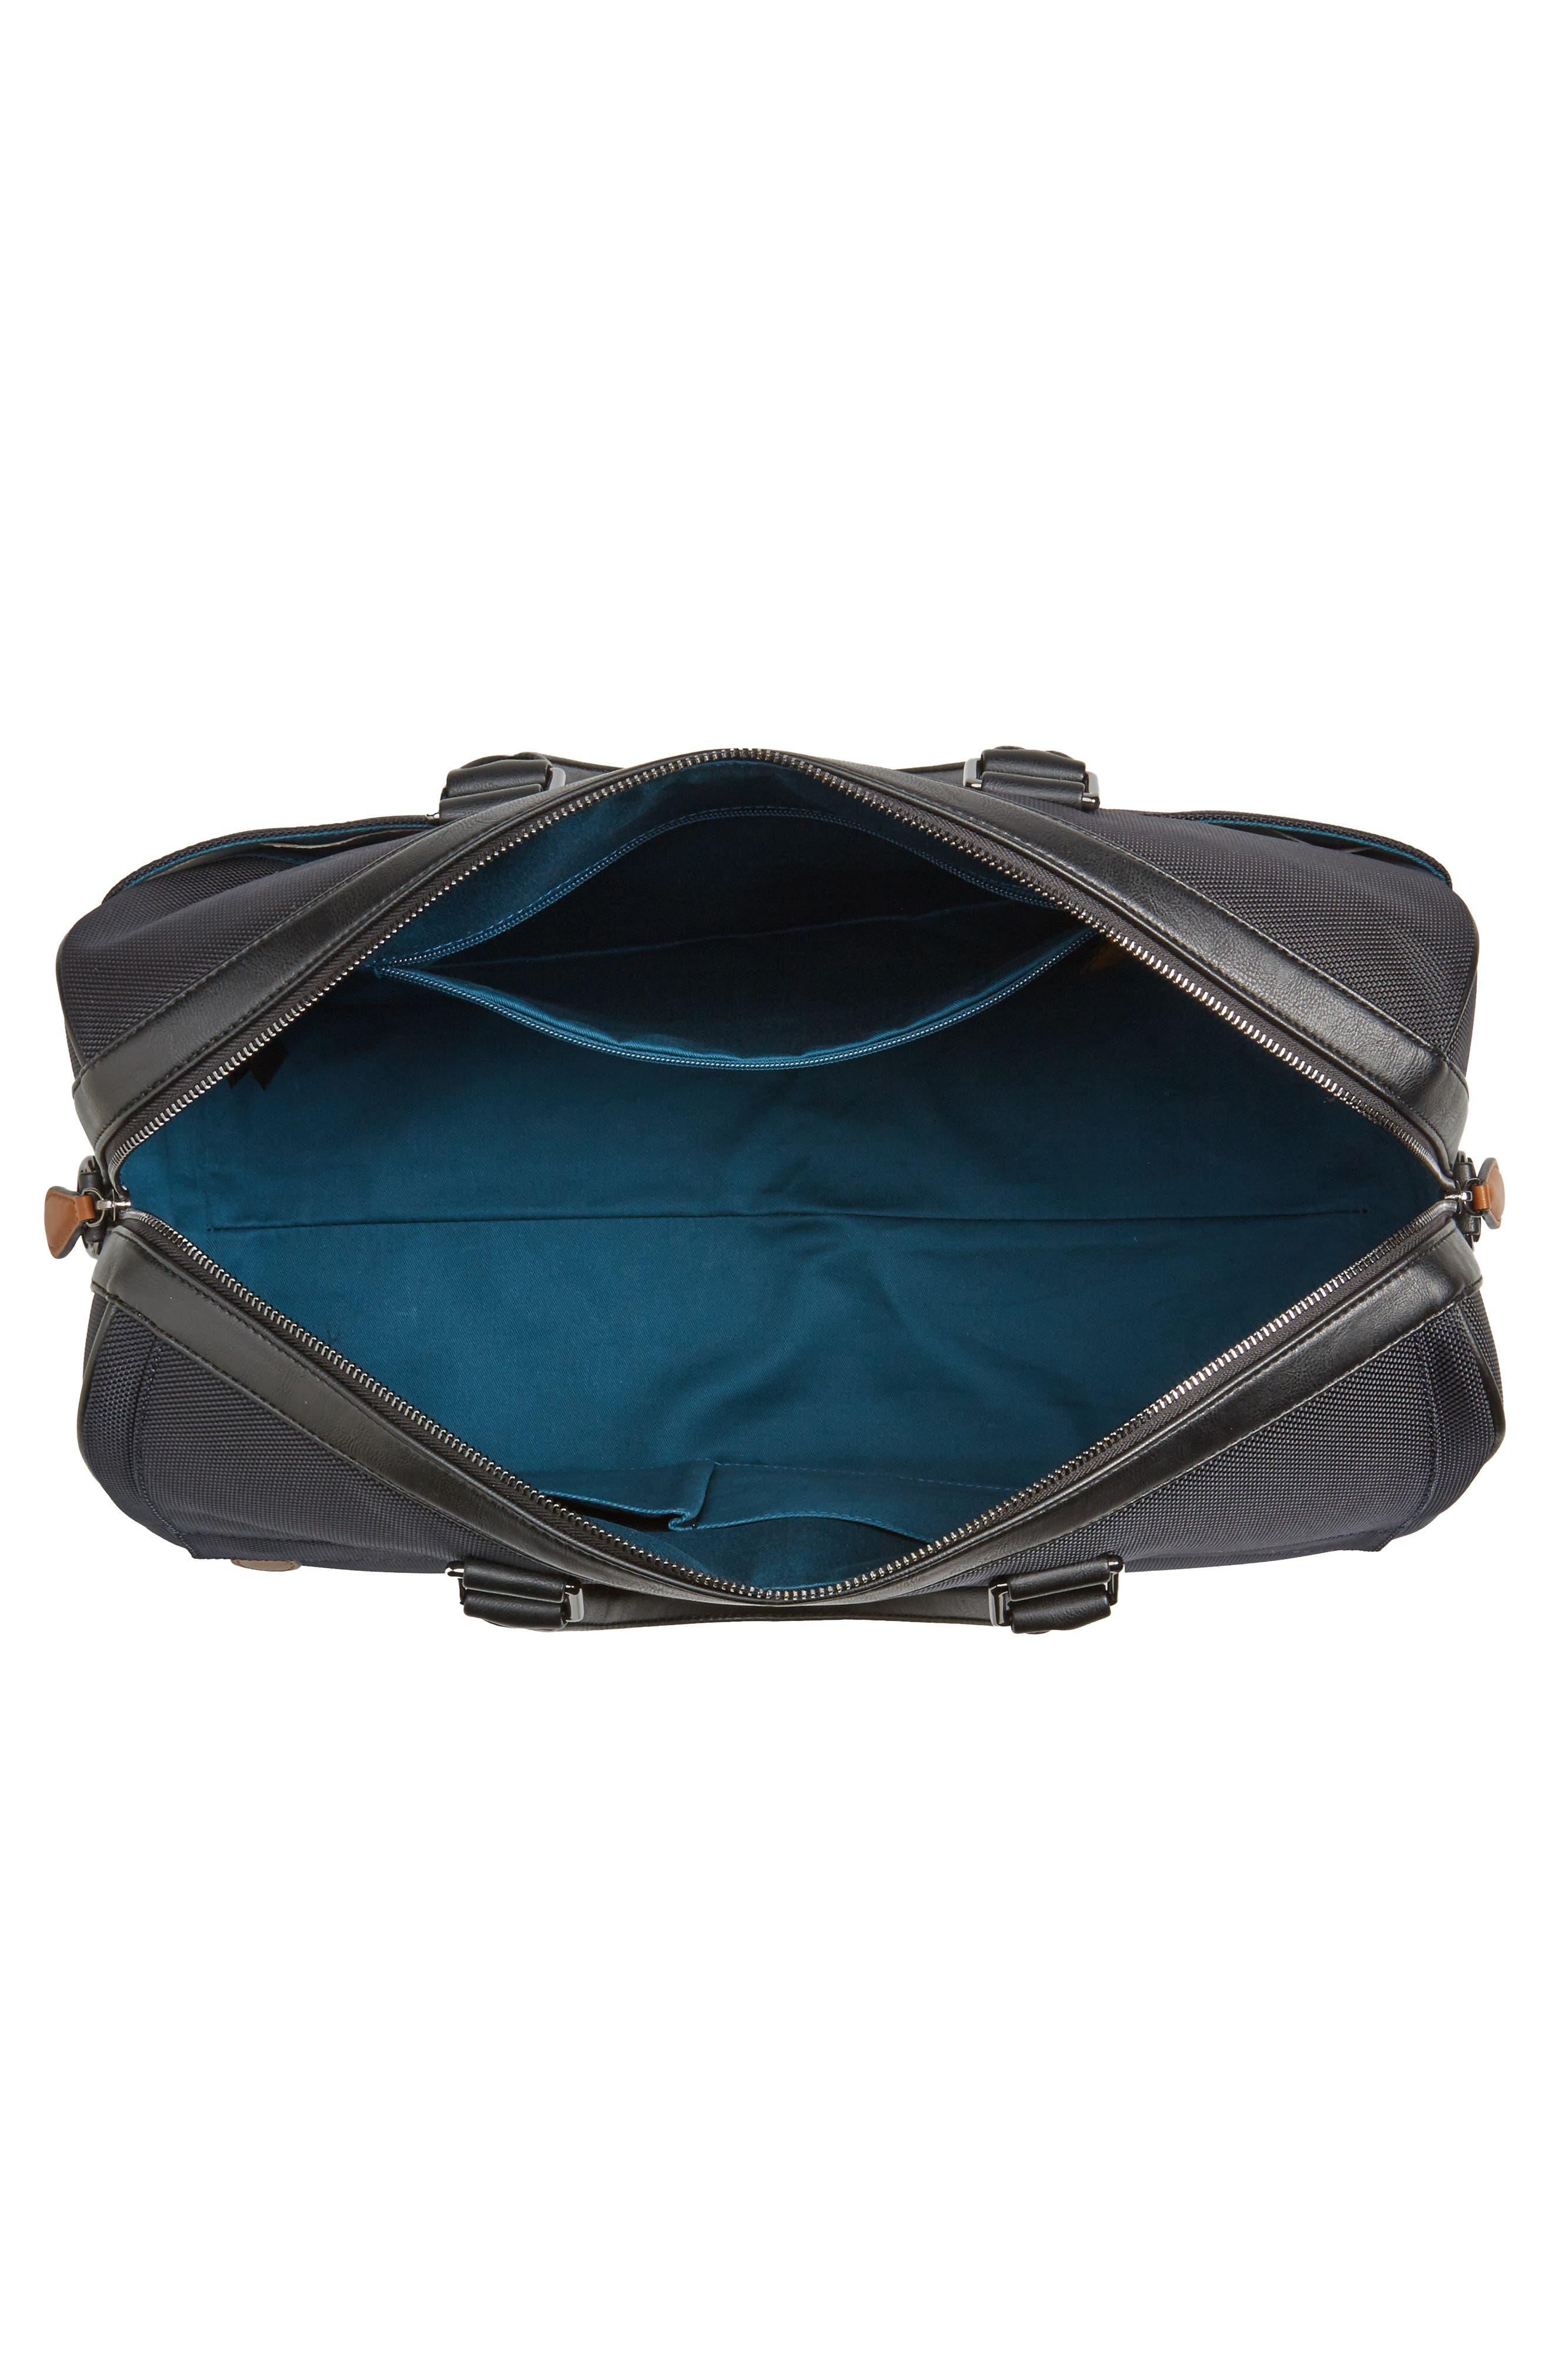 Soylant Duffel Bag,                             Alternate thumbnail 4, color,                             410